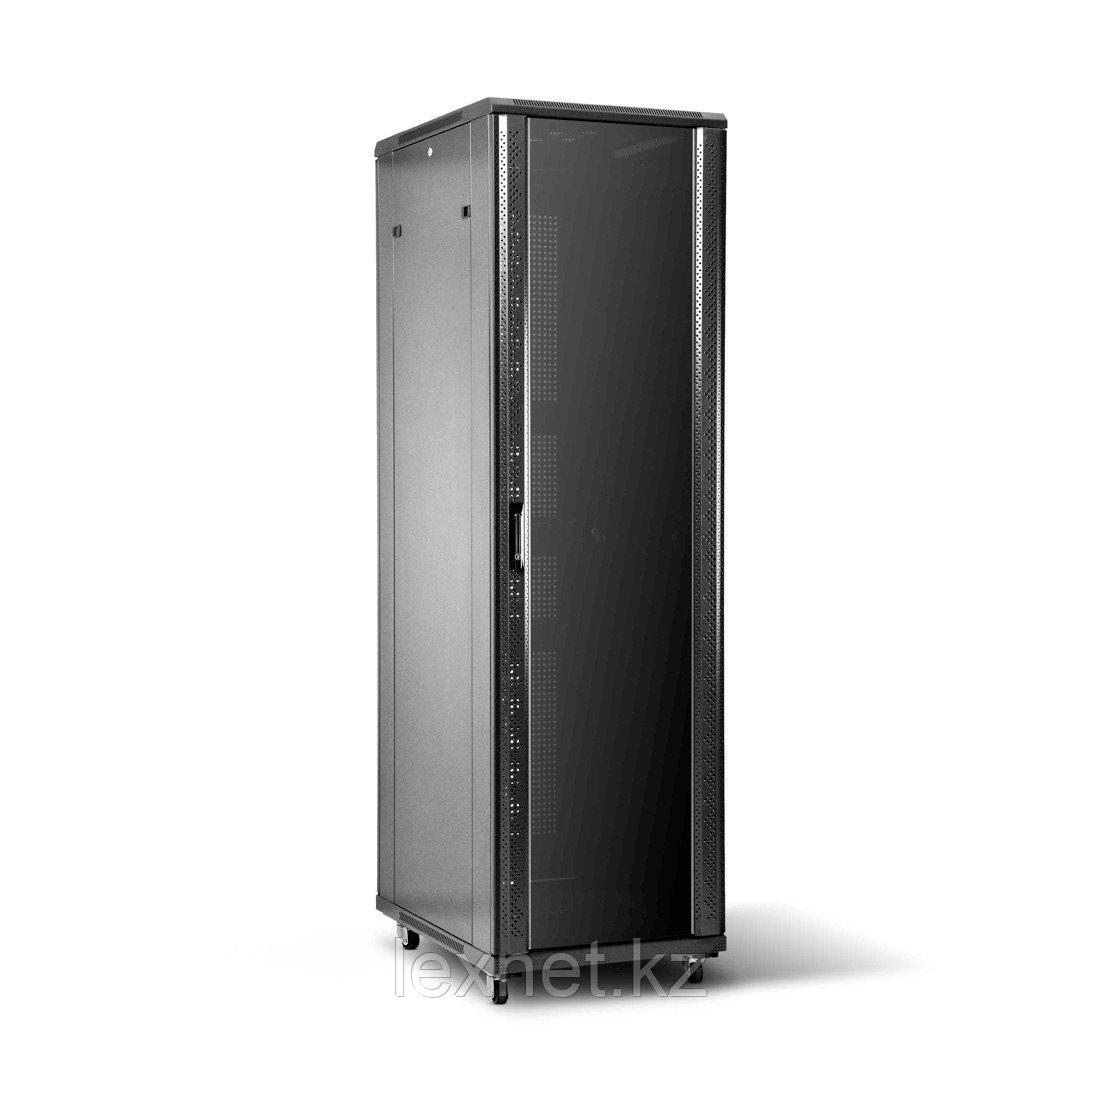 Шкаф серверный SHIP 601S.6042.24.100 42U 600*1000*2000 мм